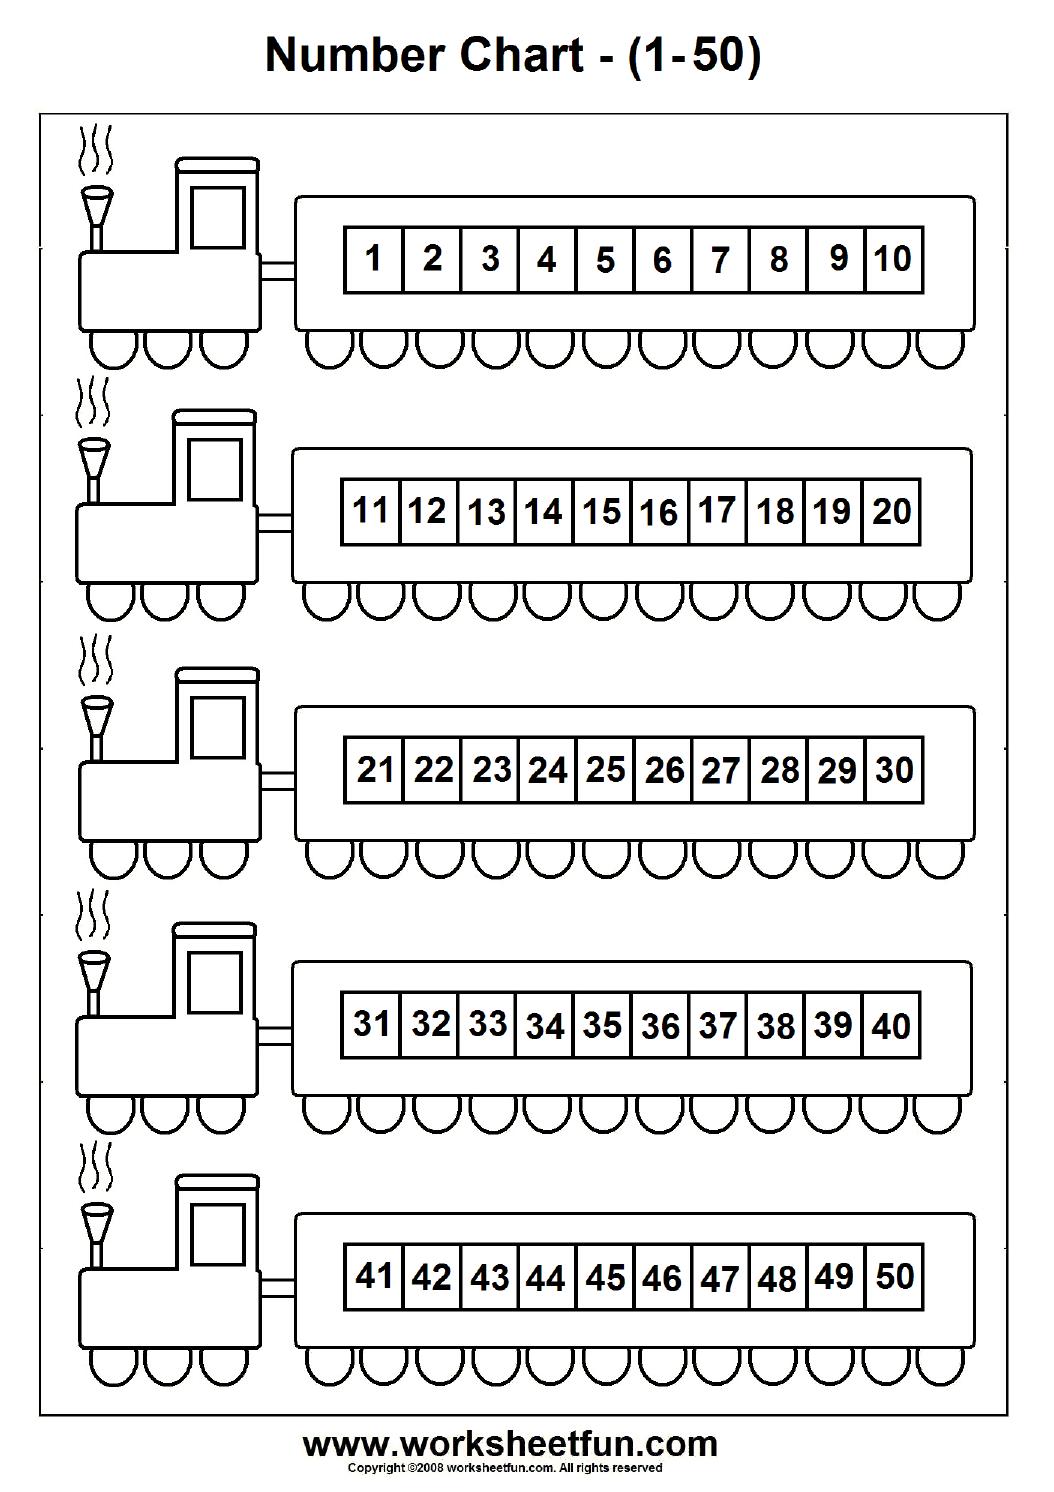 Number Chart 1 50 Free Printable Worksheets Worksheetfun